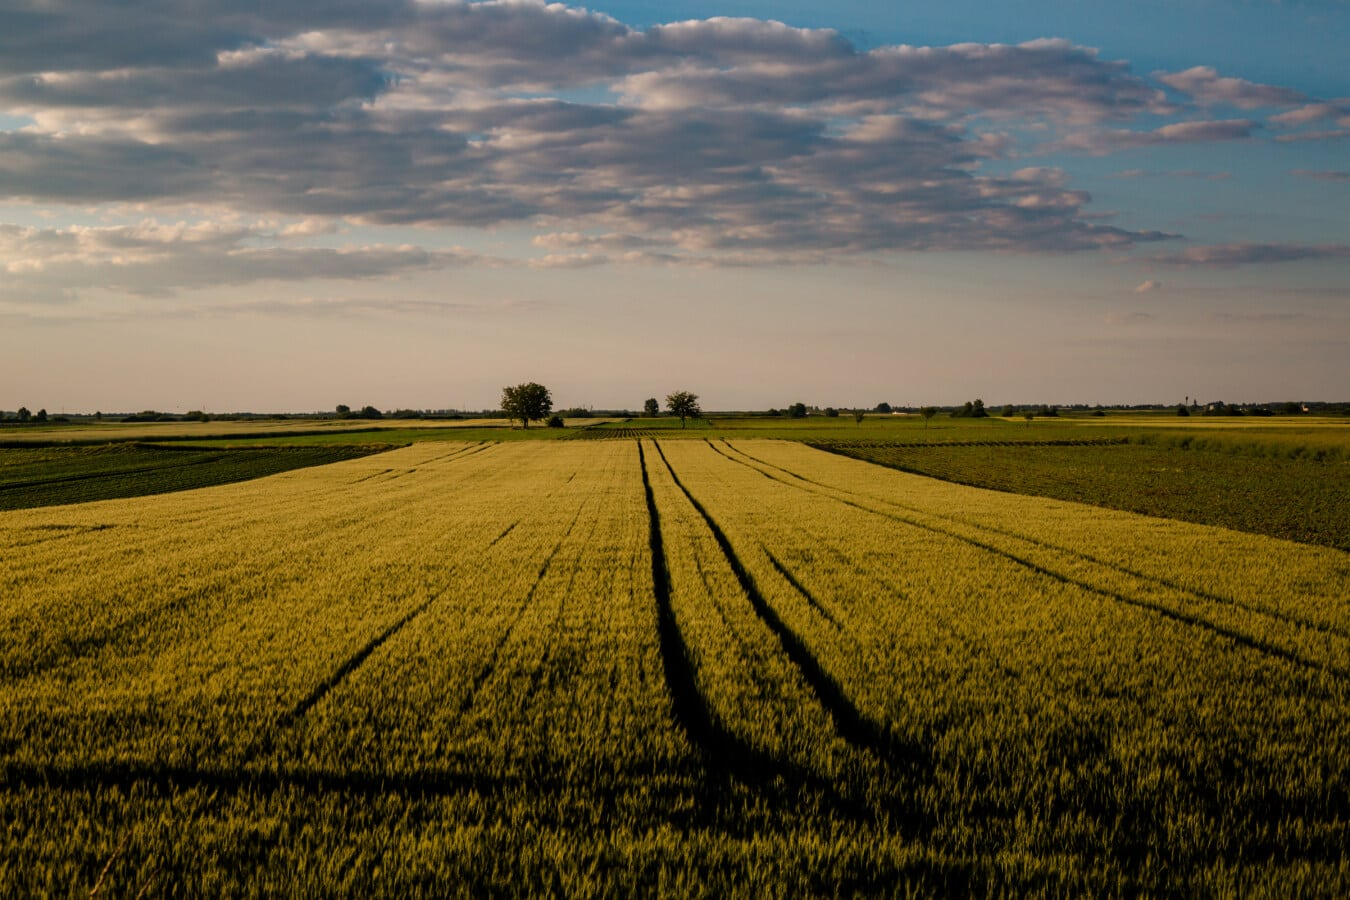 calm, atmosphere, field, barley, agriculture, dusk, meadow, farm, sunset, wheat